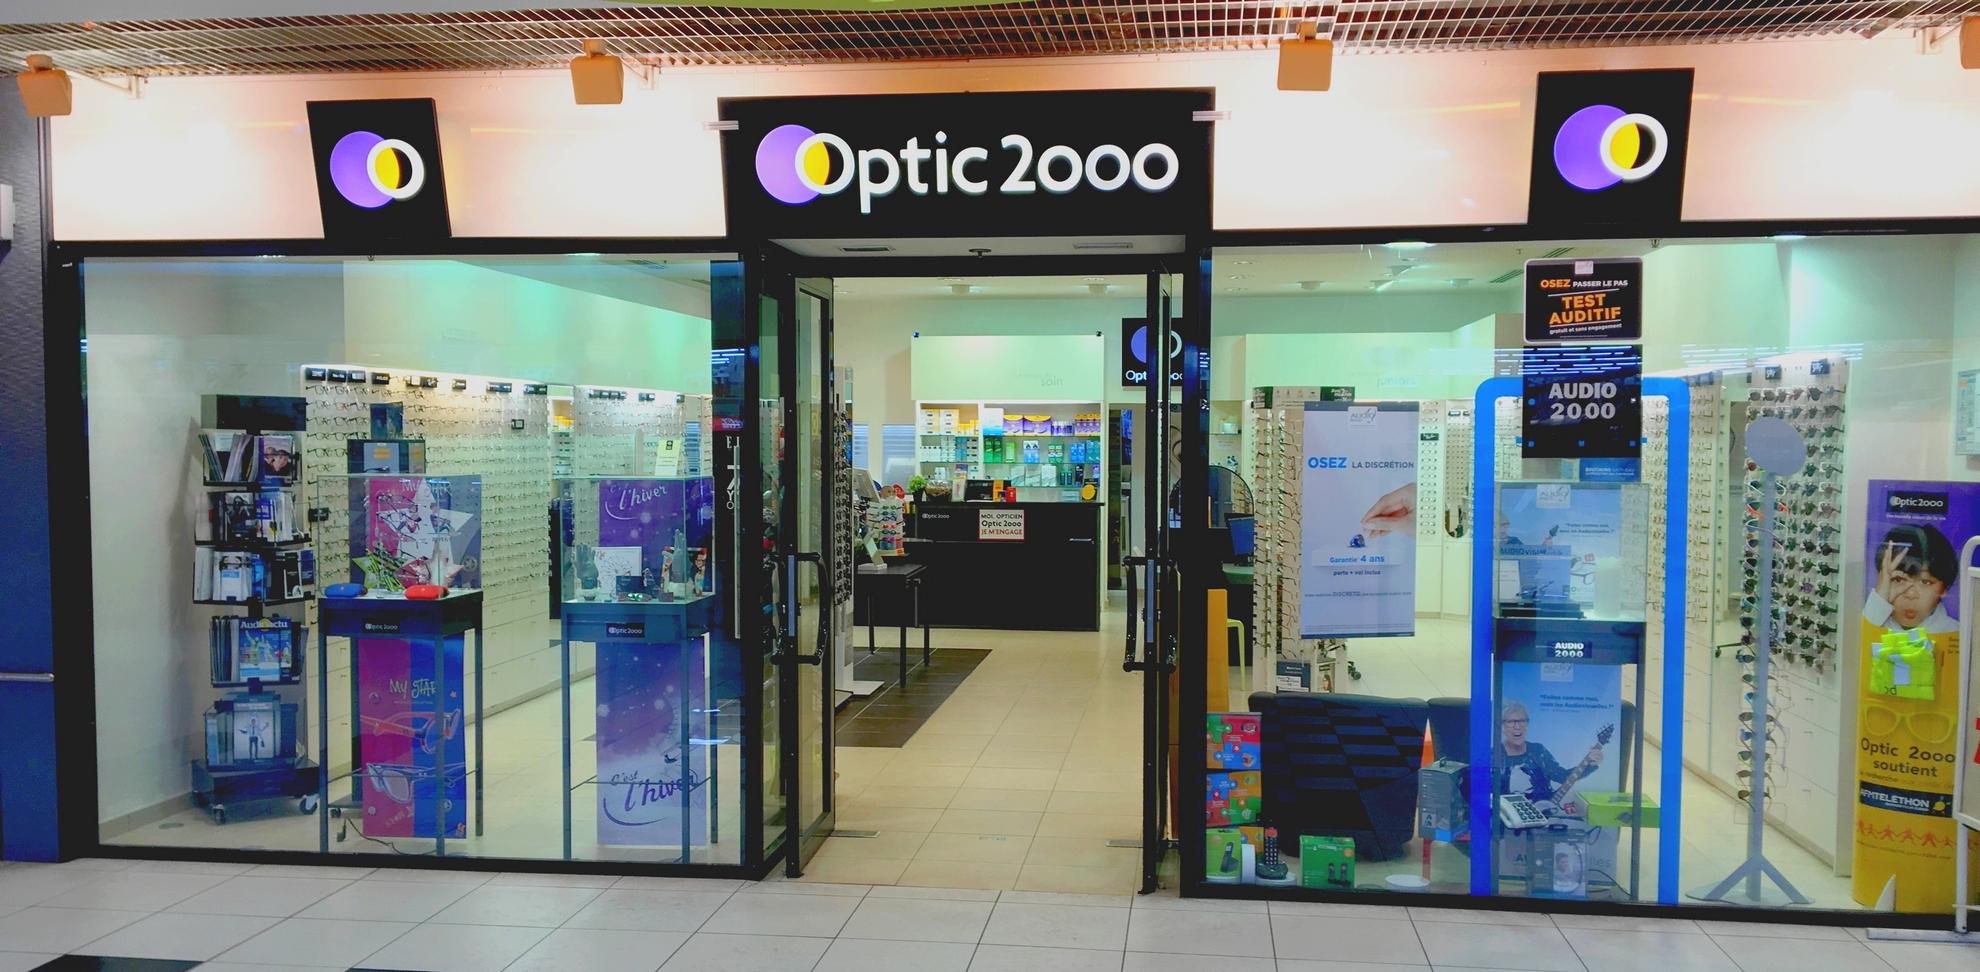 dd8196937c201 Opticien Optic 2000 BRIE COMTE ROBERT 77170 - lunettes femme ...